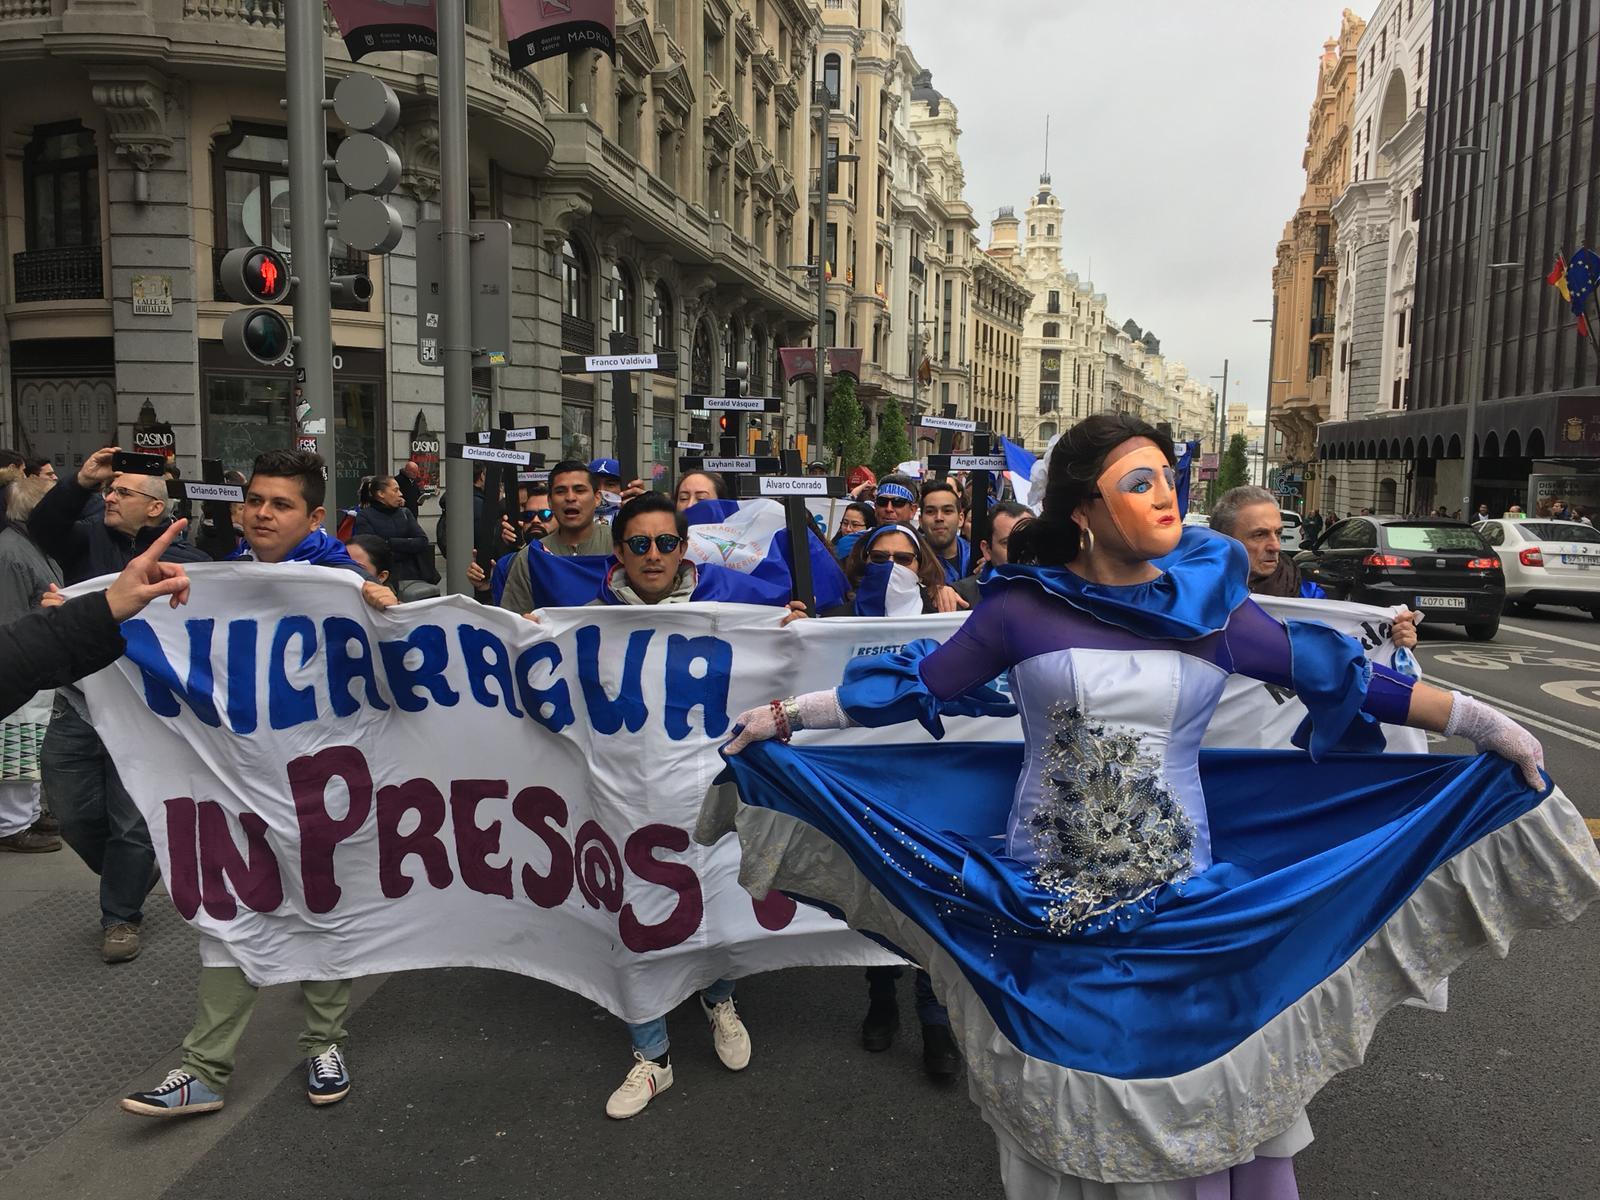 Foto: H. Sevilla